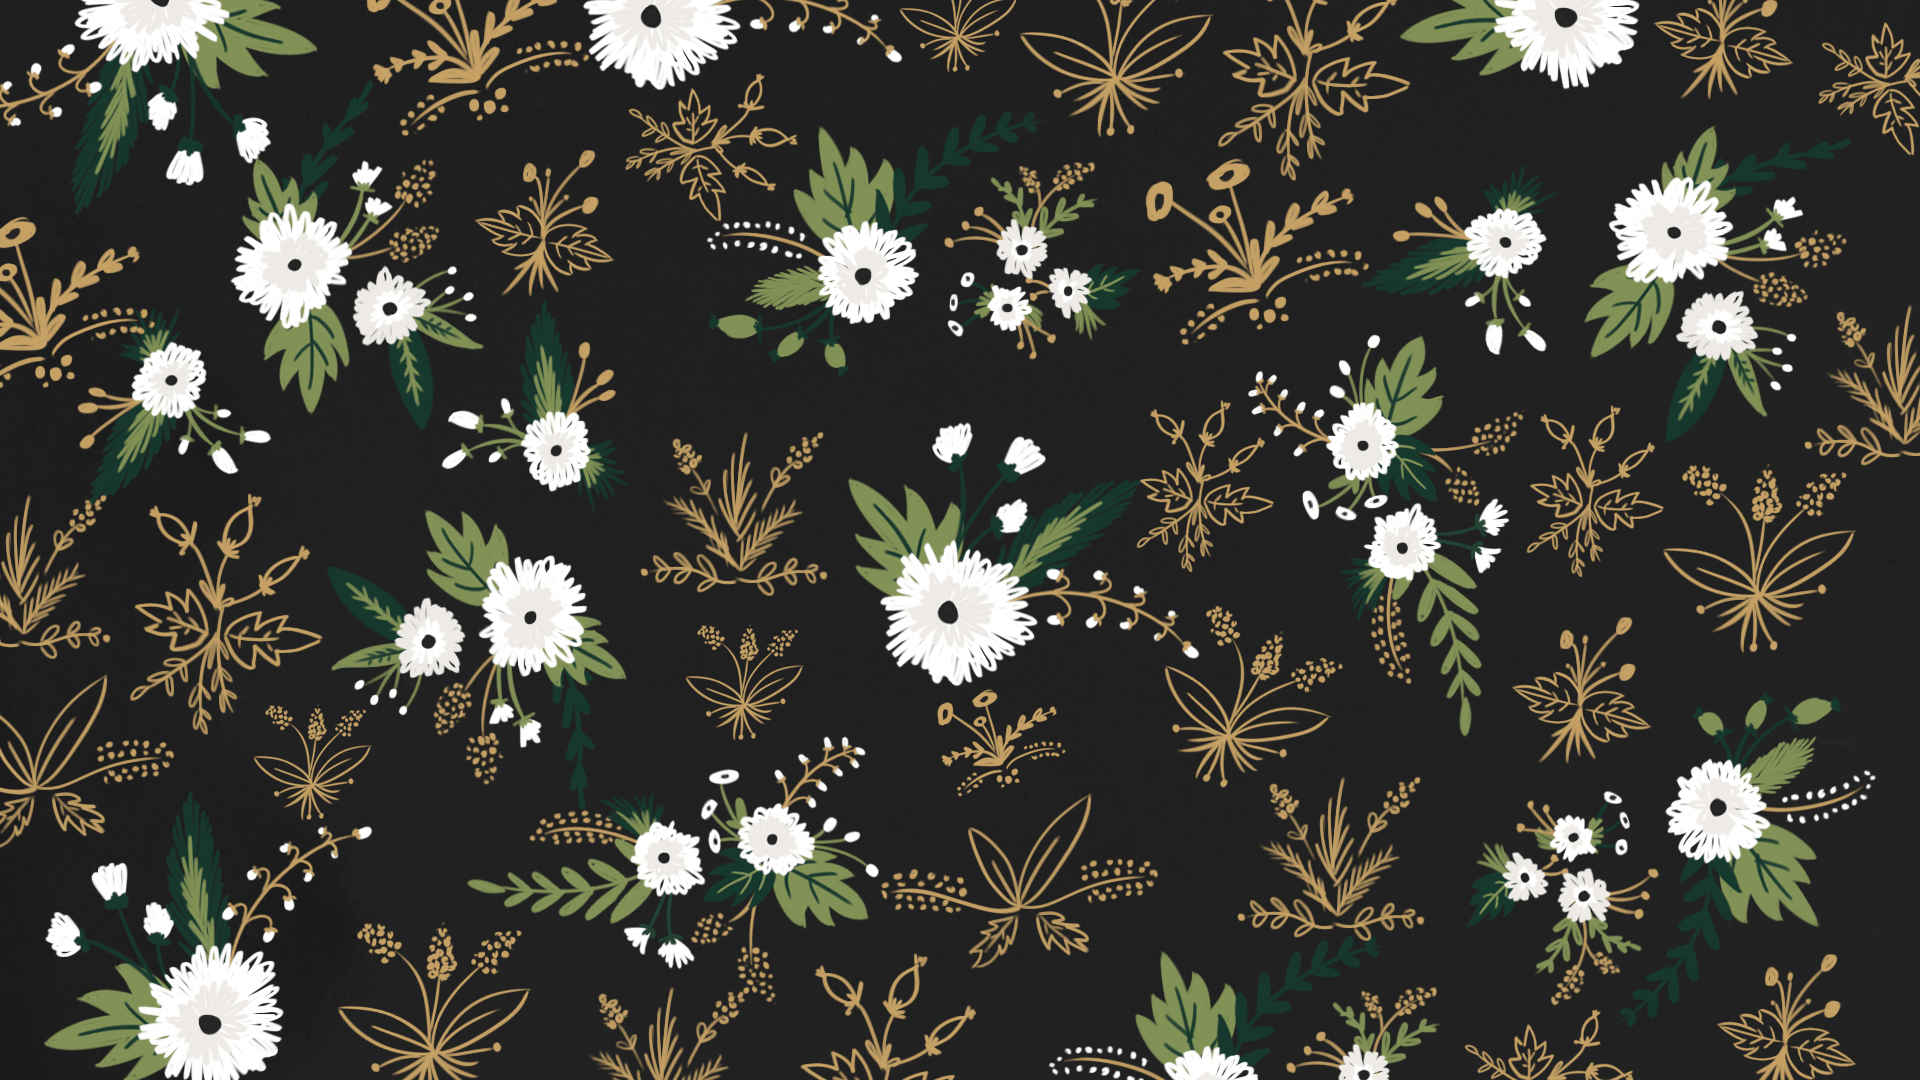 Black Floral Wallpaper Phone Wallpaper Patterns Desktop Wallpaper Black Floral Wallpaper